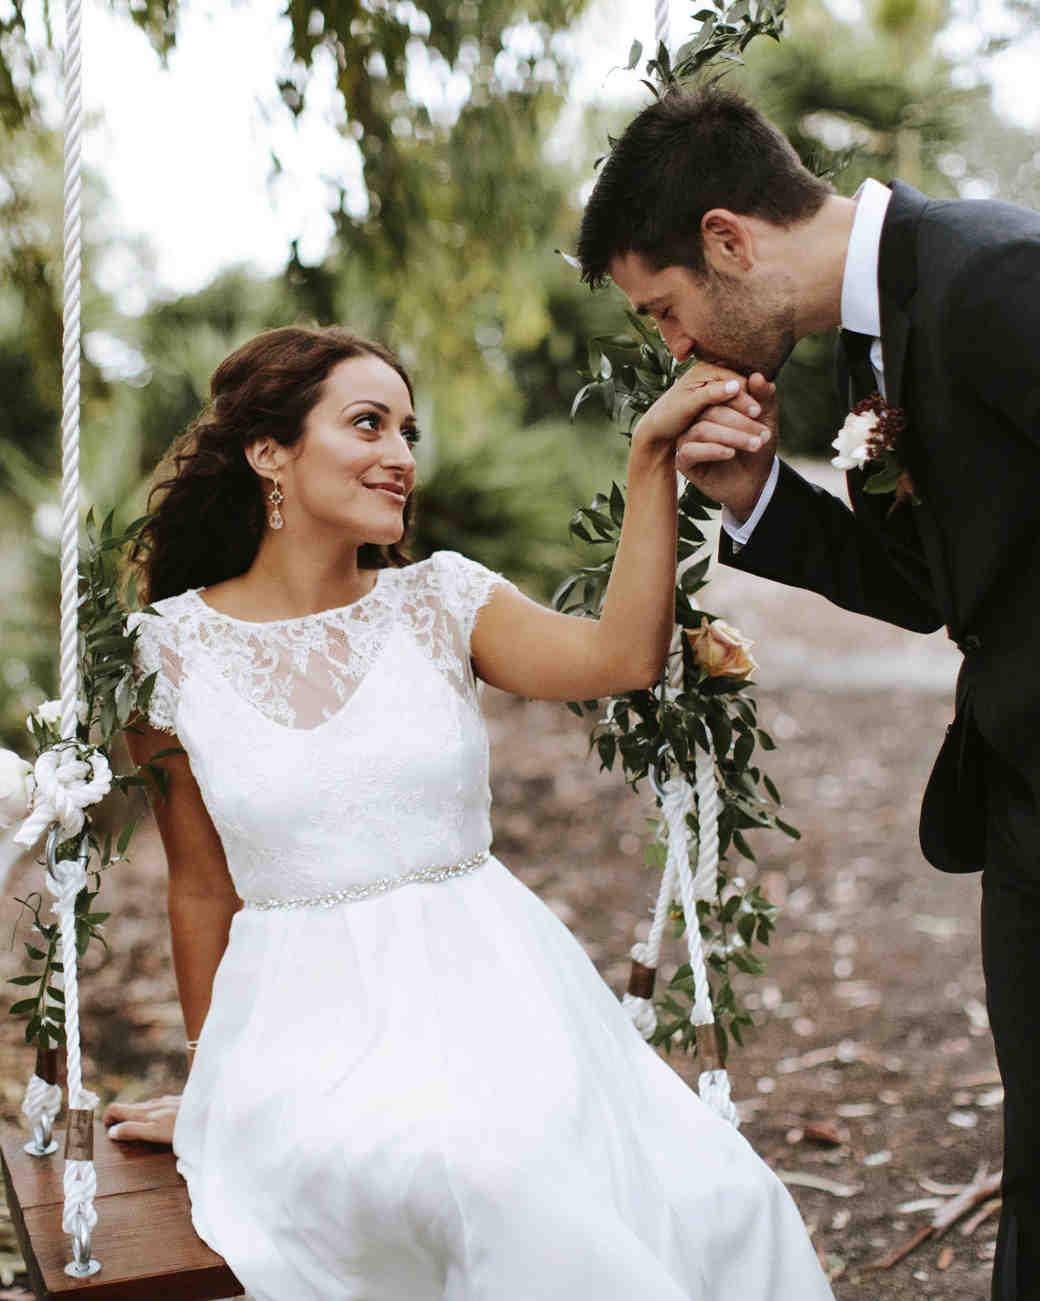 timeless wedding photos couple swing kiss hand